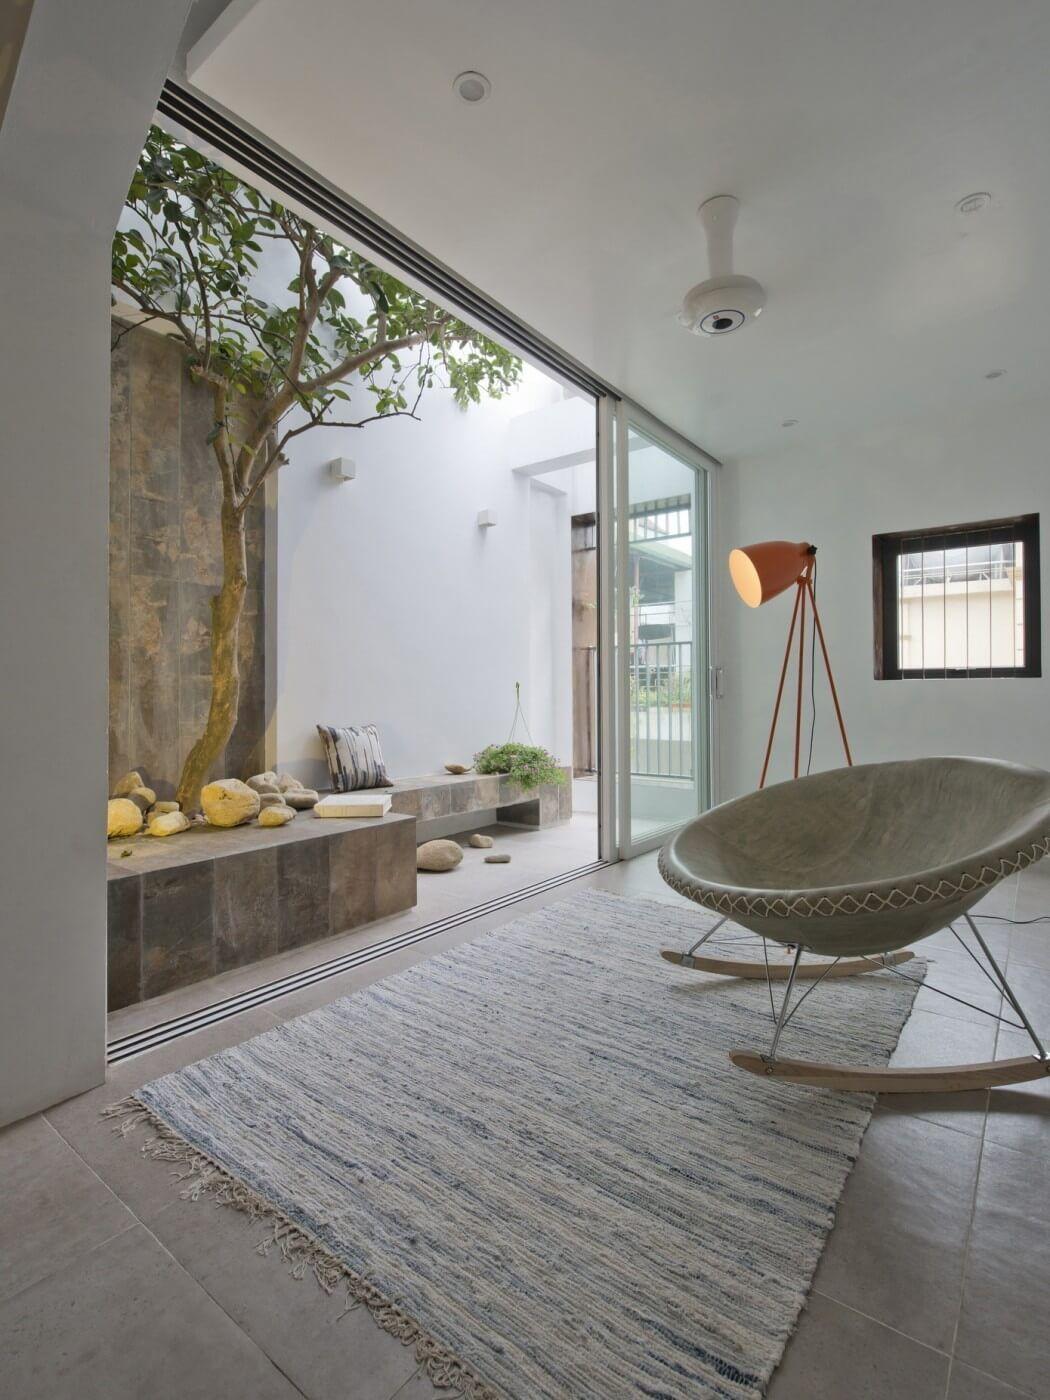 Qt House By Landmak Architecture Patio Interior House Design Home